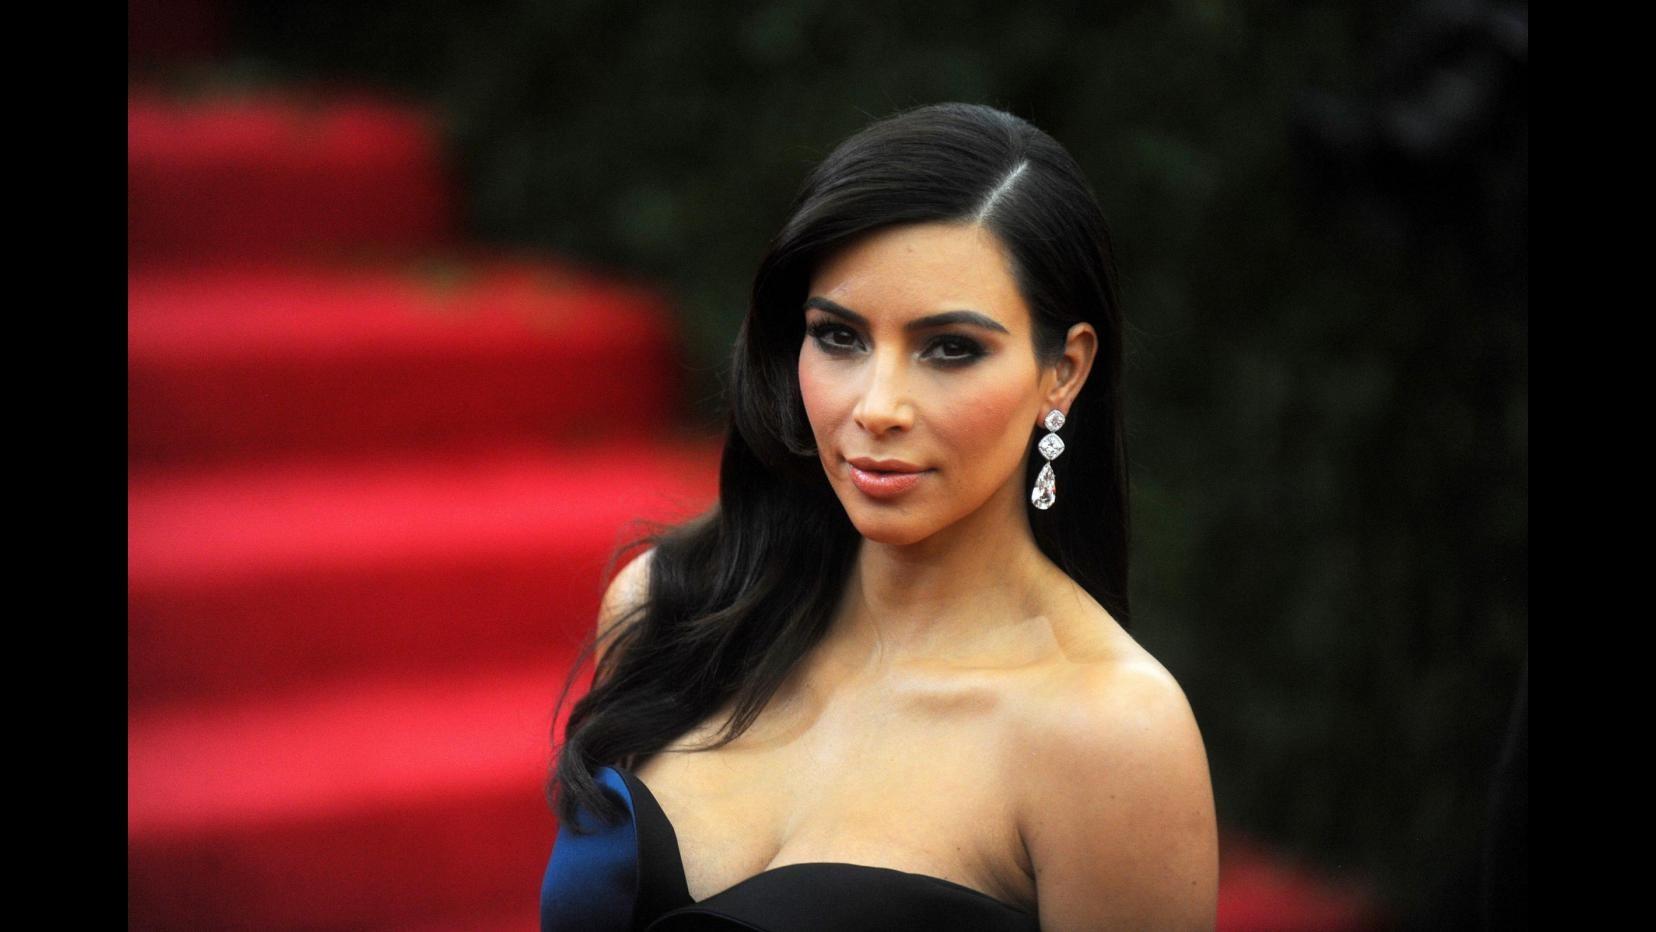 Il figlio di Kim Kardashian e Kanye West si chiama Saint